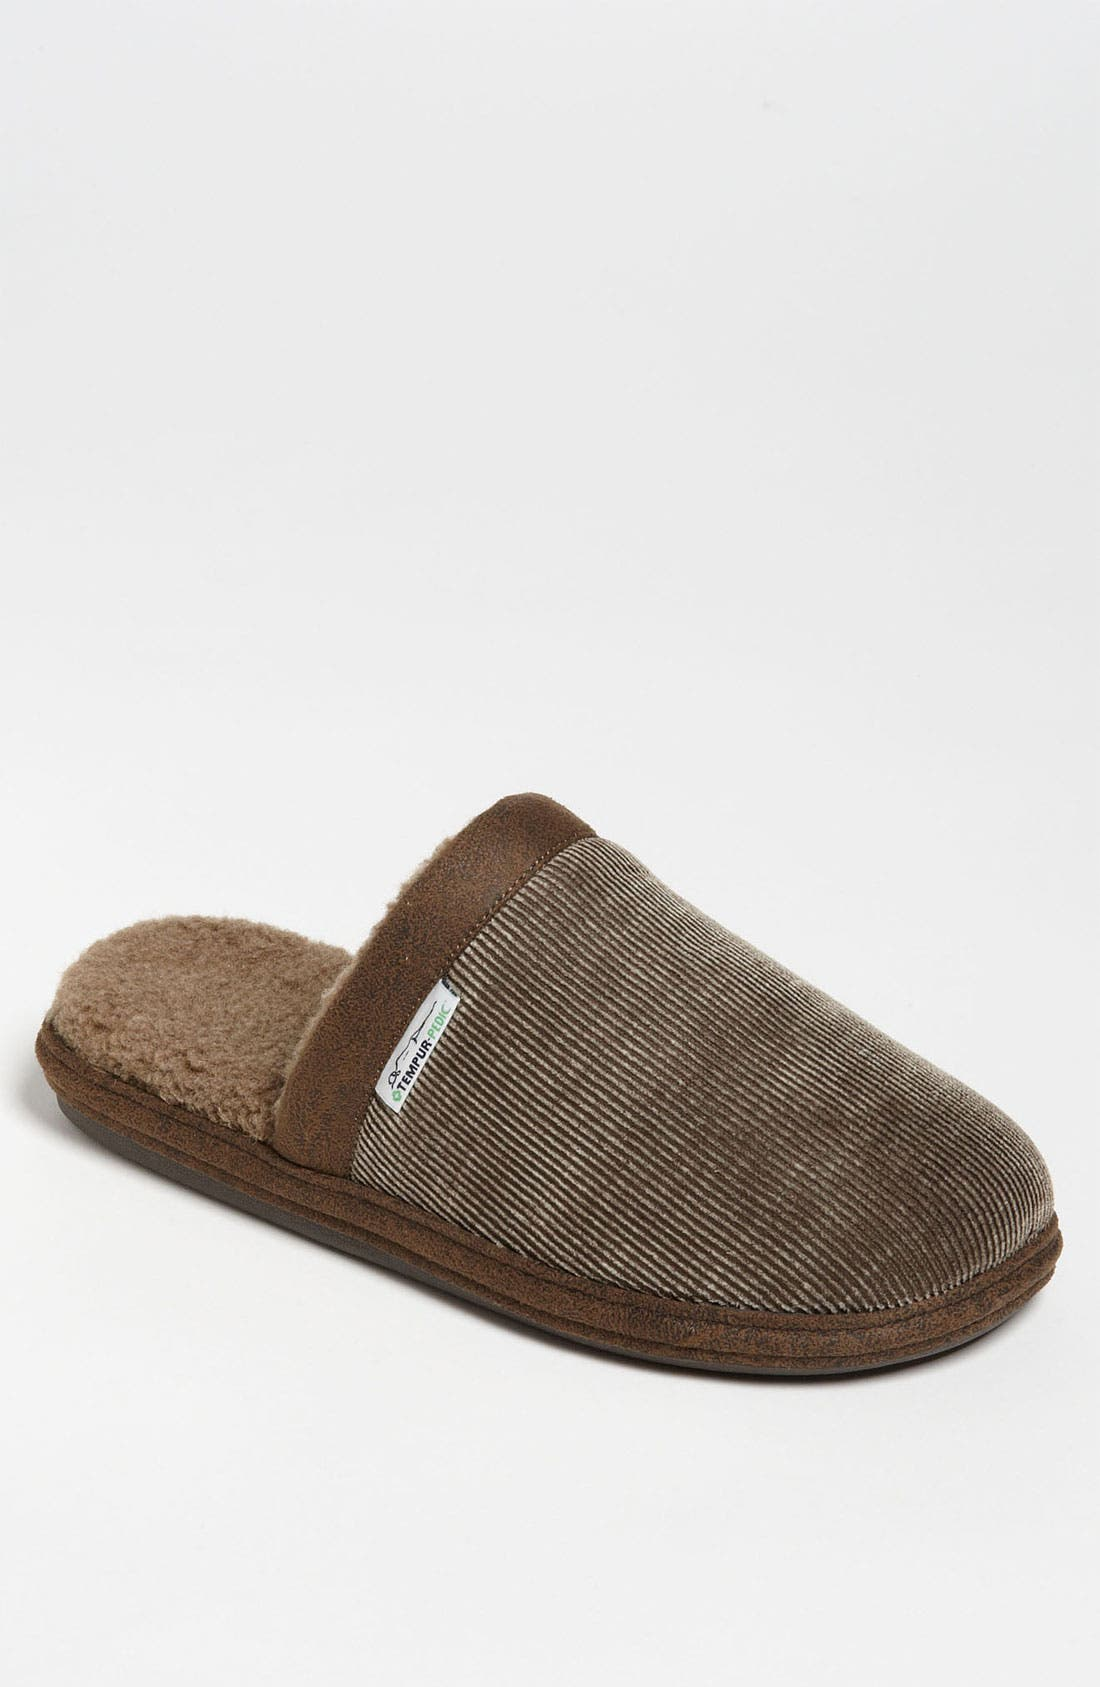 Alternate Image 1 Selected - Tempur-Pedic® 'Corduroy Scuff' Slipper